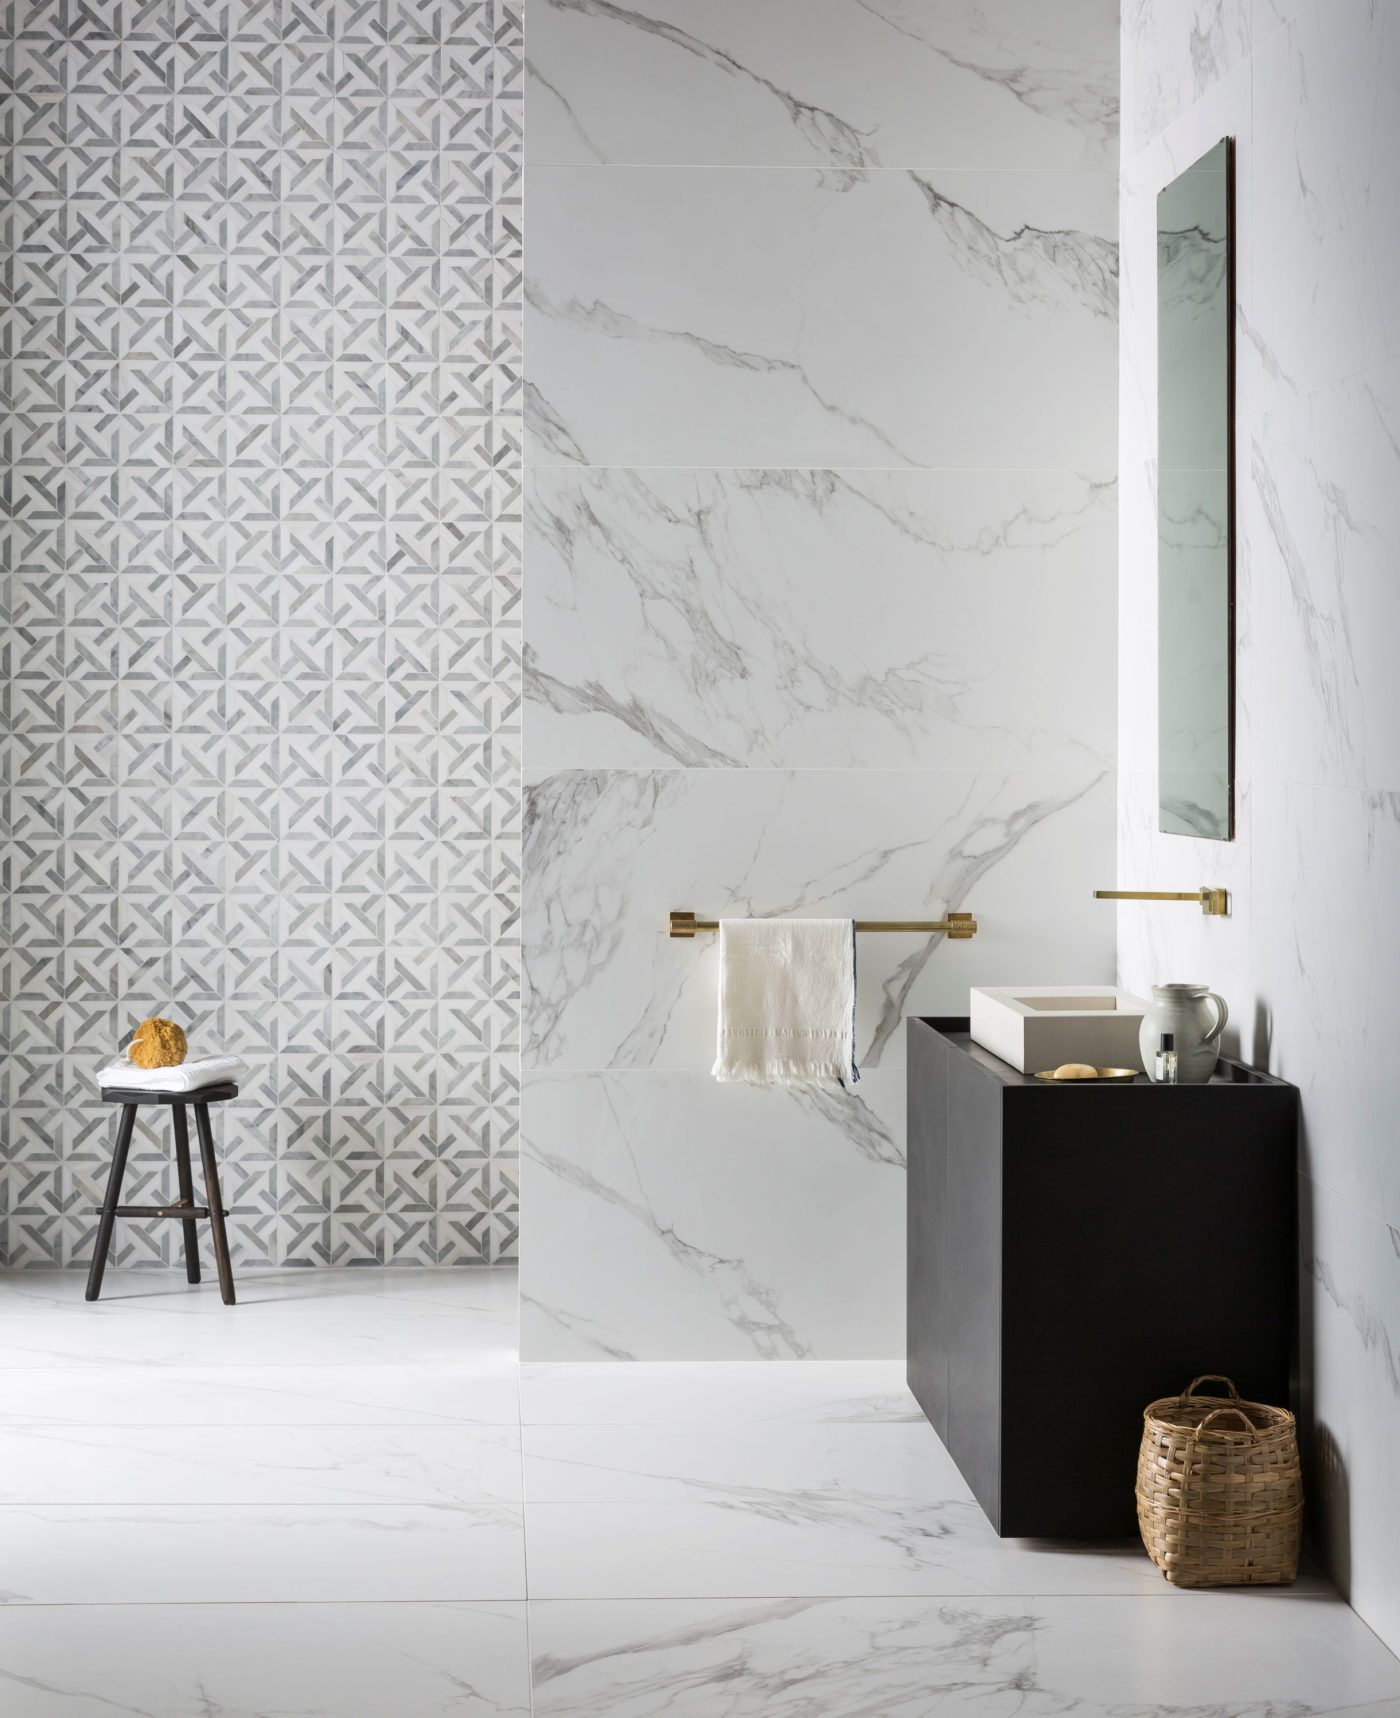 Mimica Bianco Ravenna Matt Porcelain Tiles - Mandarin Stone